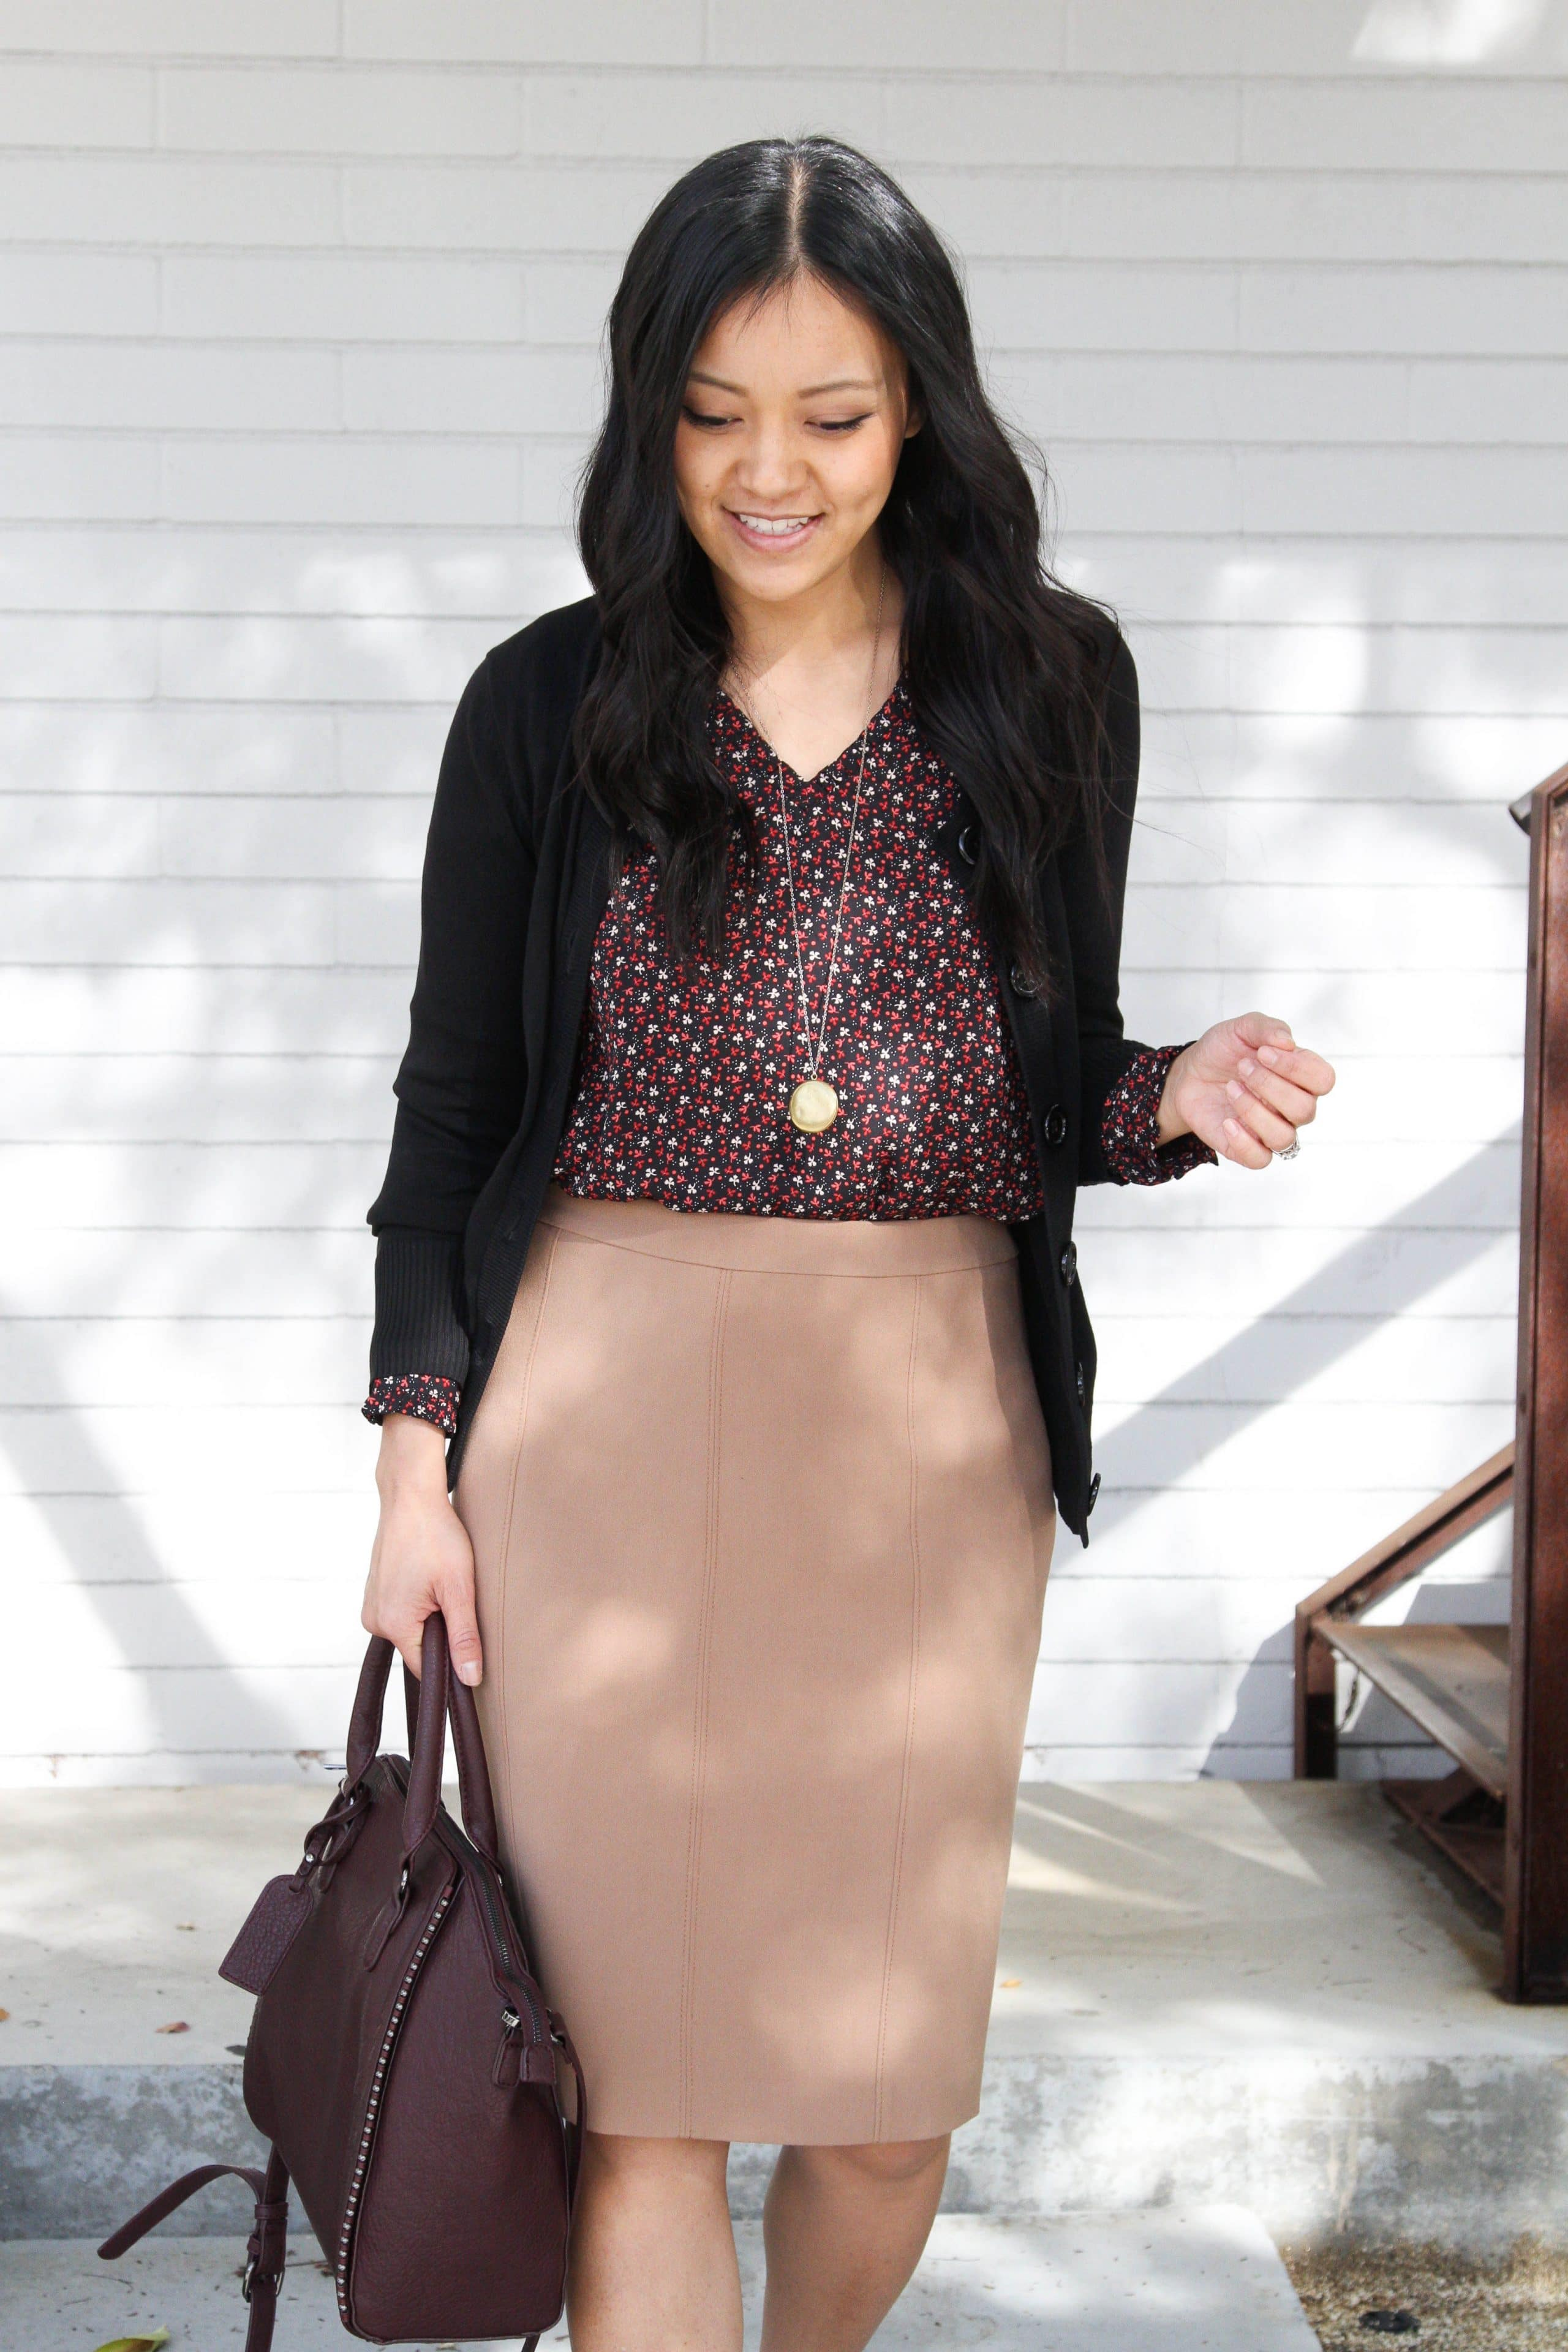 Black Cardigan + Floral Blouse + Tan Pencil Skirt + Maroon bag